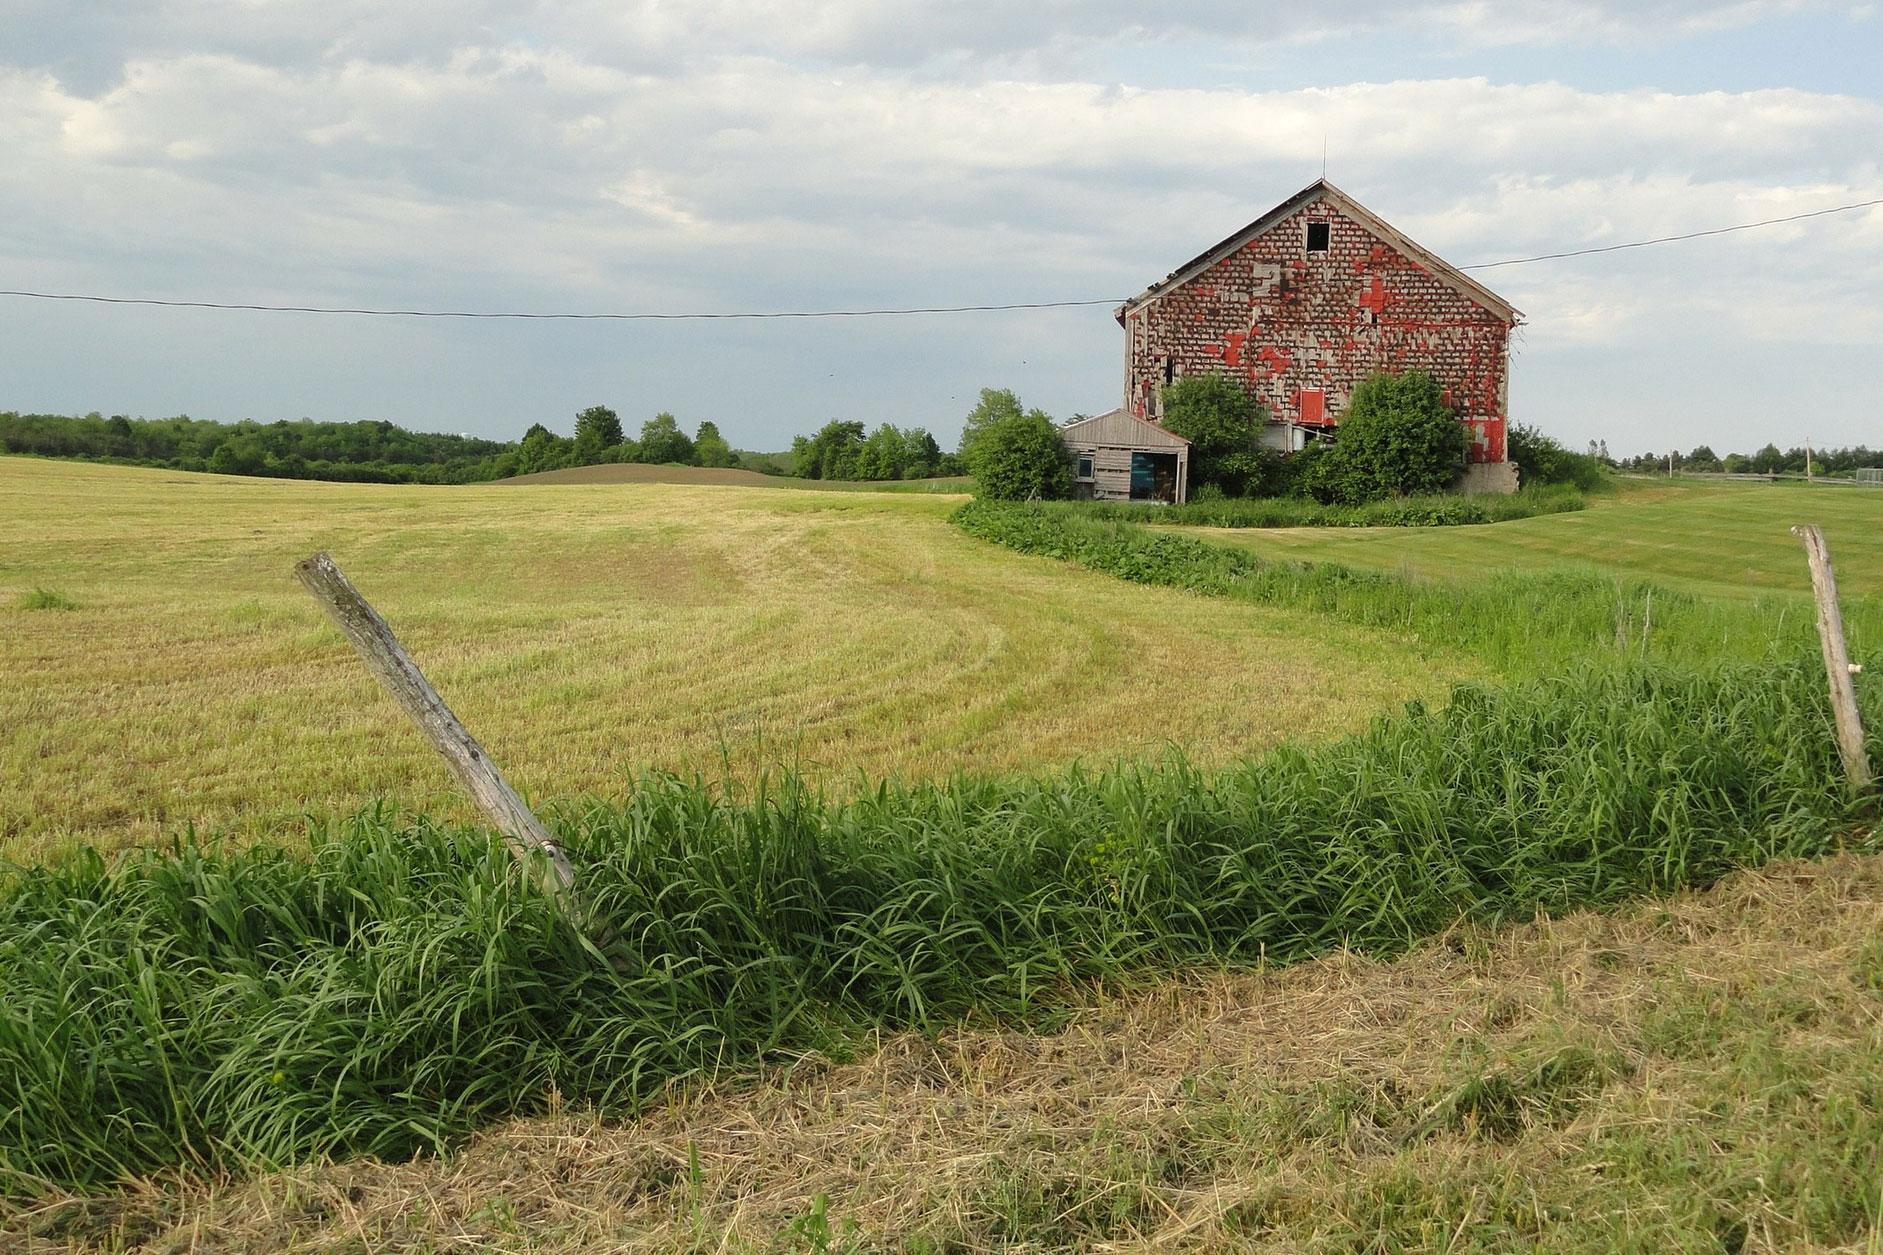 rendu-1-image-gratuite-internet--old-barns-289903_1920